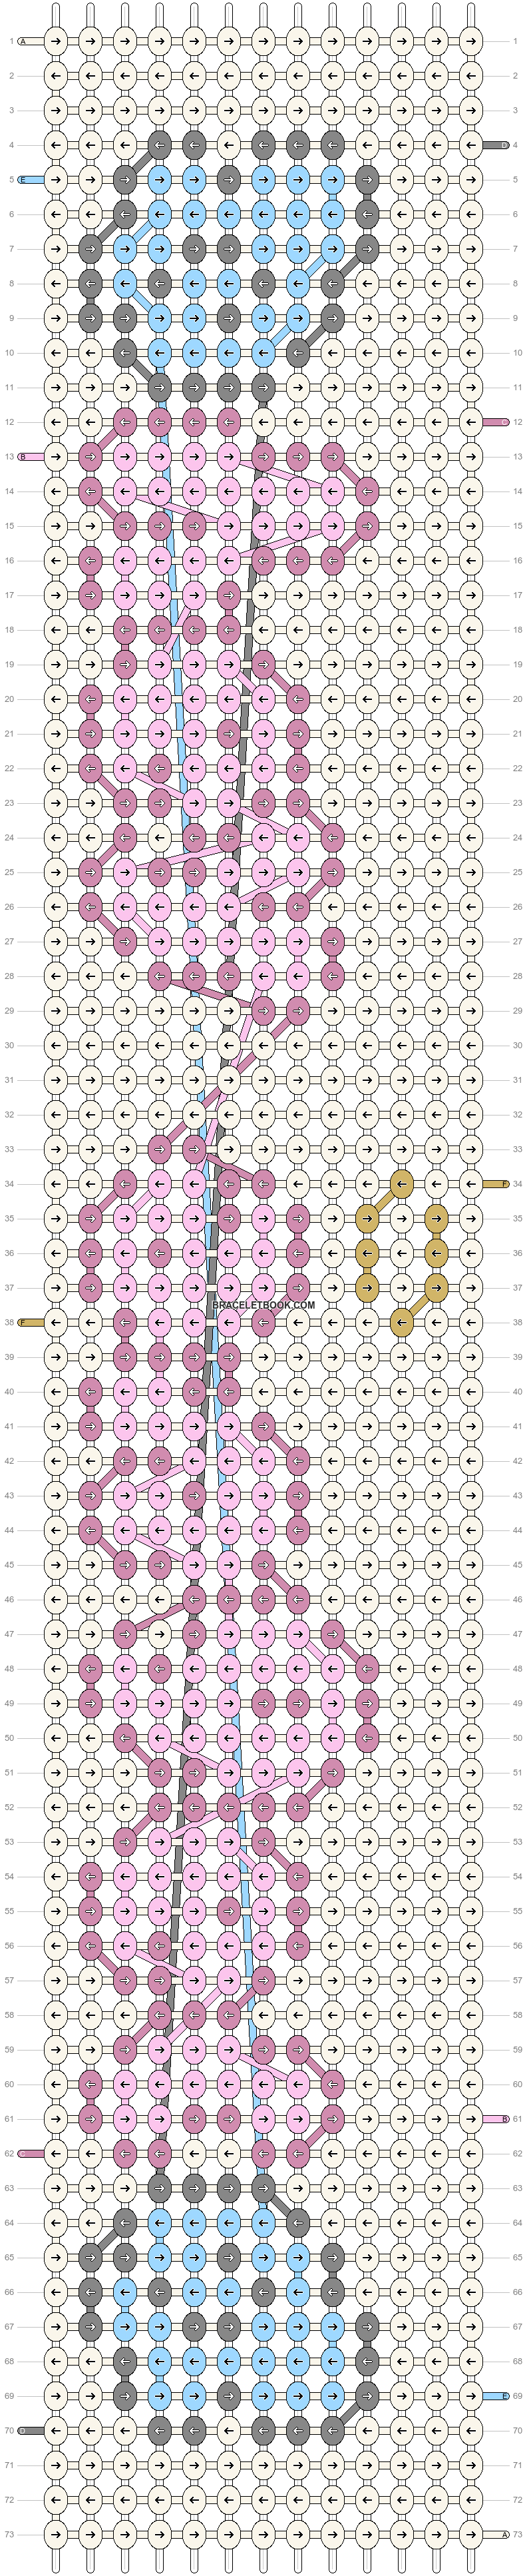 Alpha pattern #83707 pattern